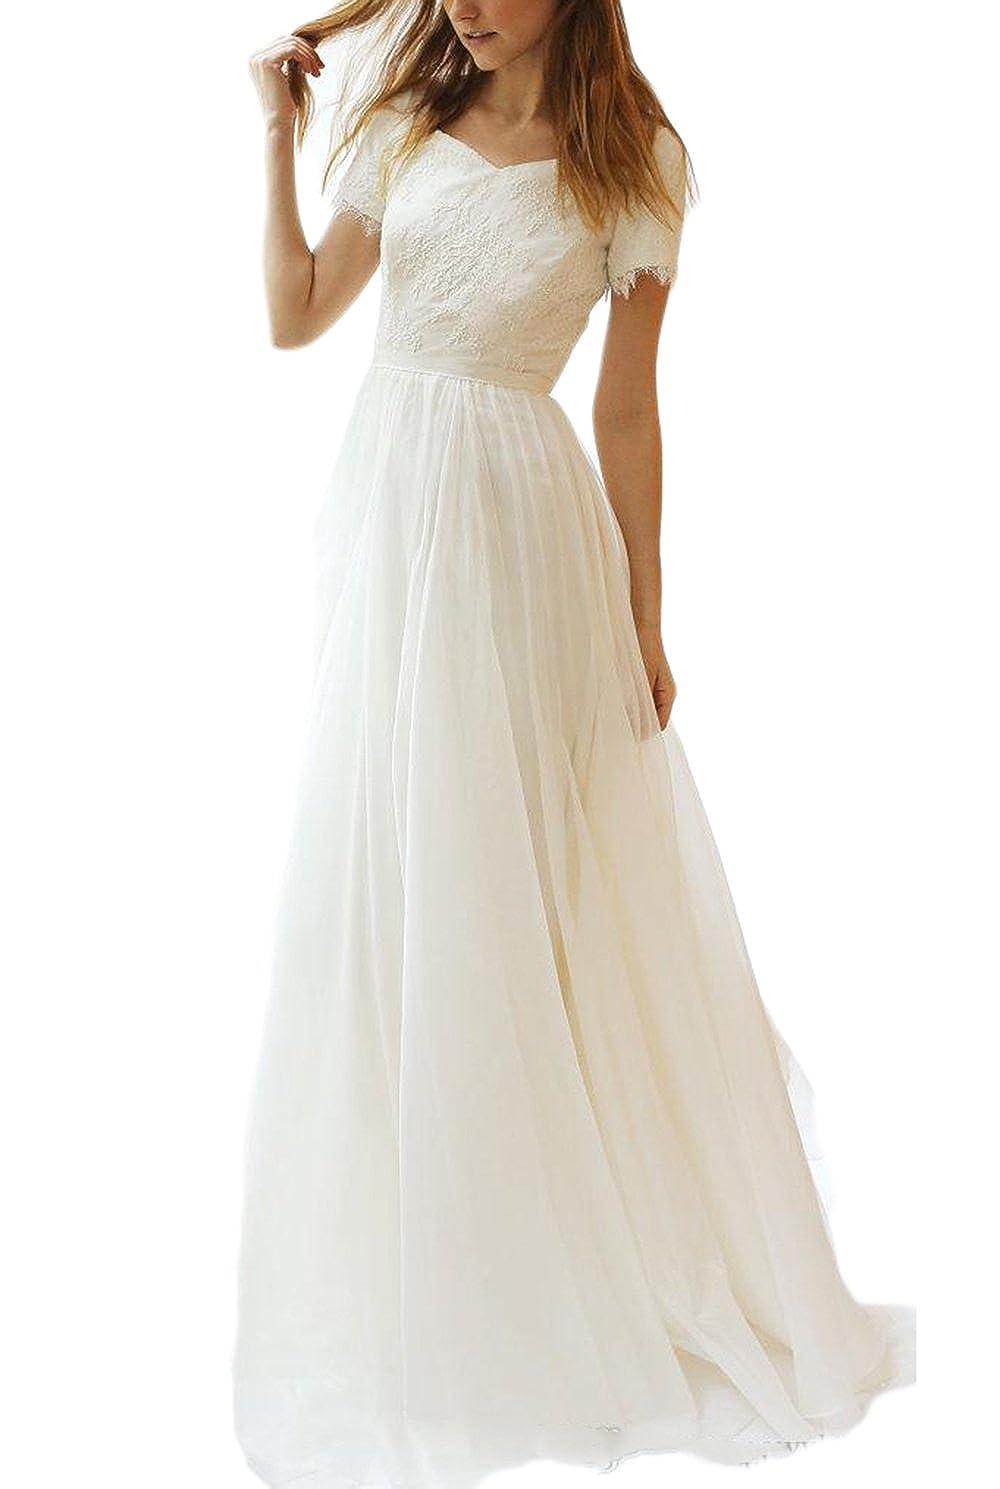 Veilace Womens Lace Chiffon Wedding Dress Short Sleeves A Line